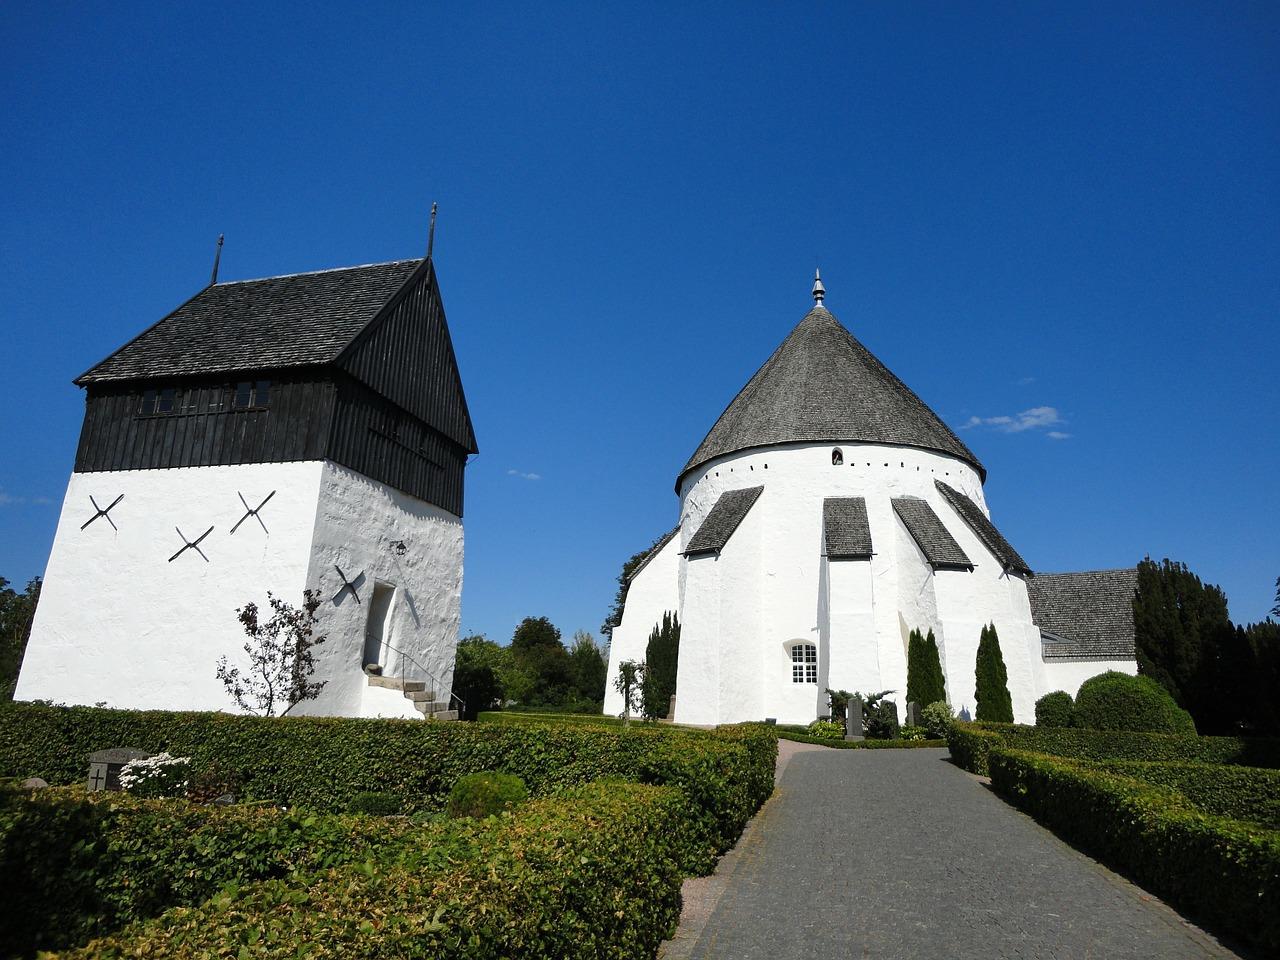 Reiseziel Bornholm